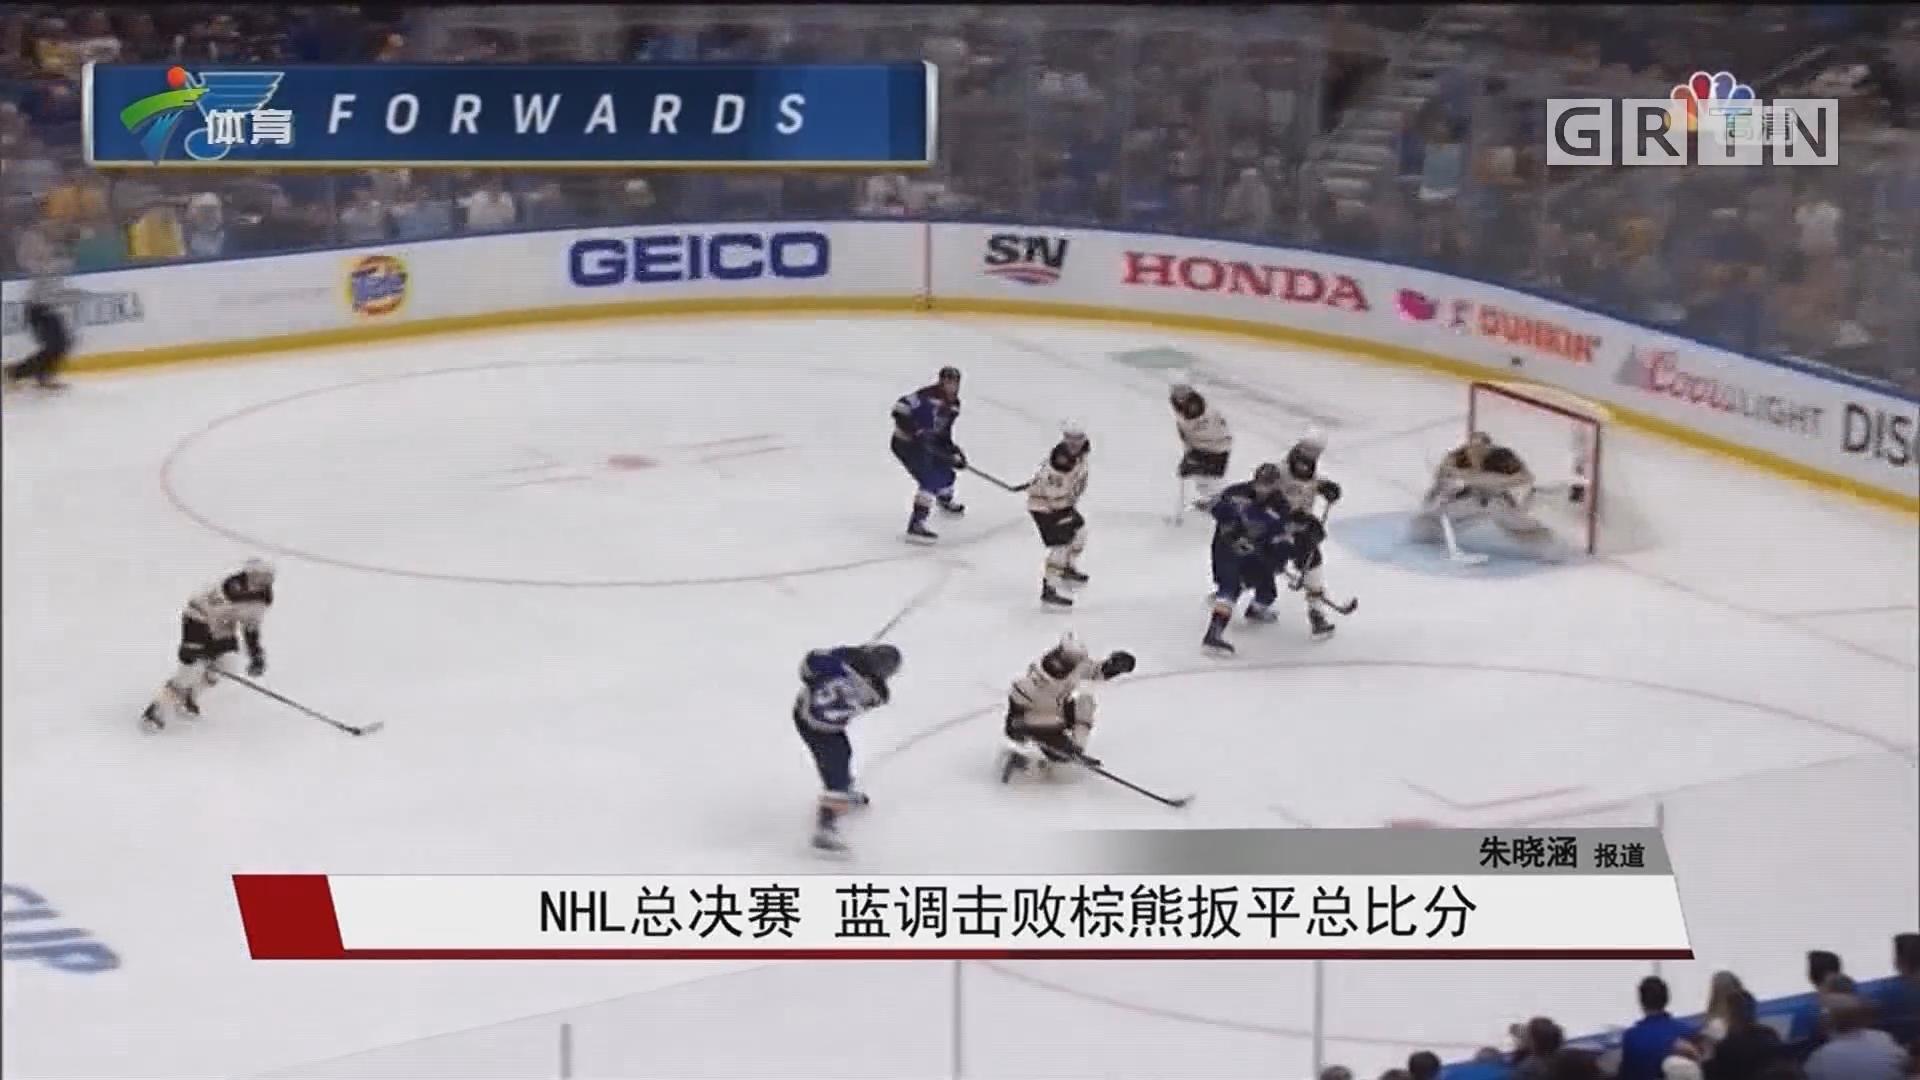 NHL总决赛 蓝调击败棕熊扳平总比分